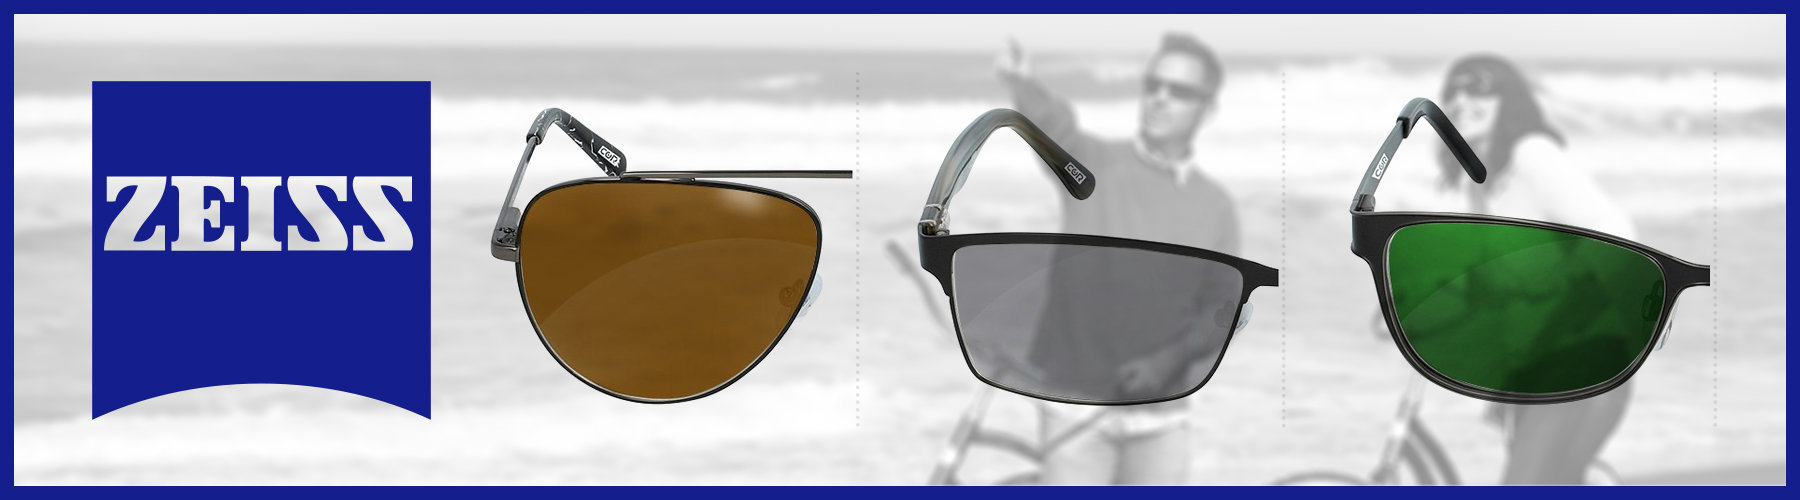 ZEISS Sunglass Lenses | Mens & Womens | Prescription & Non